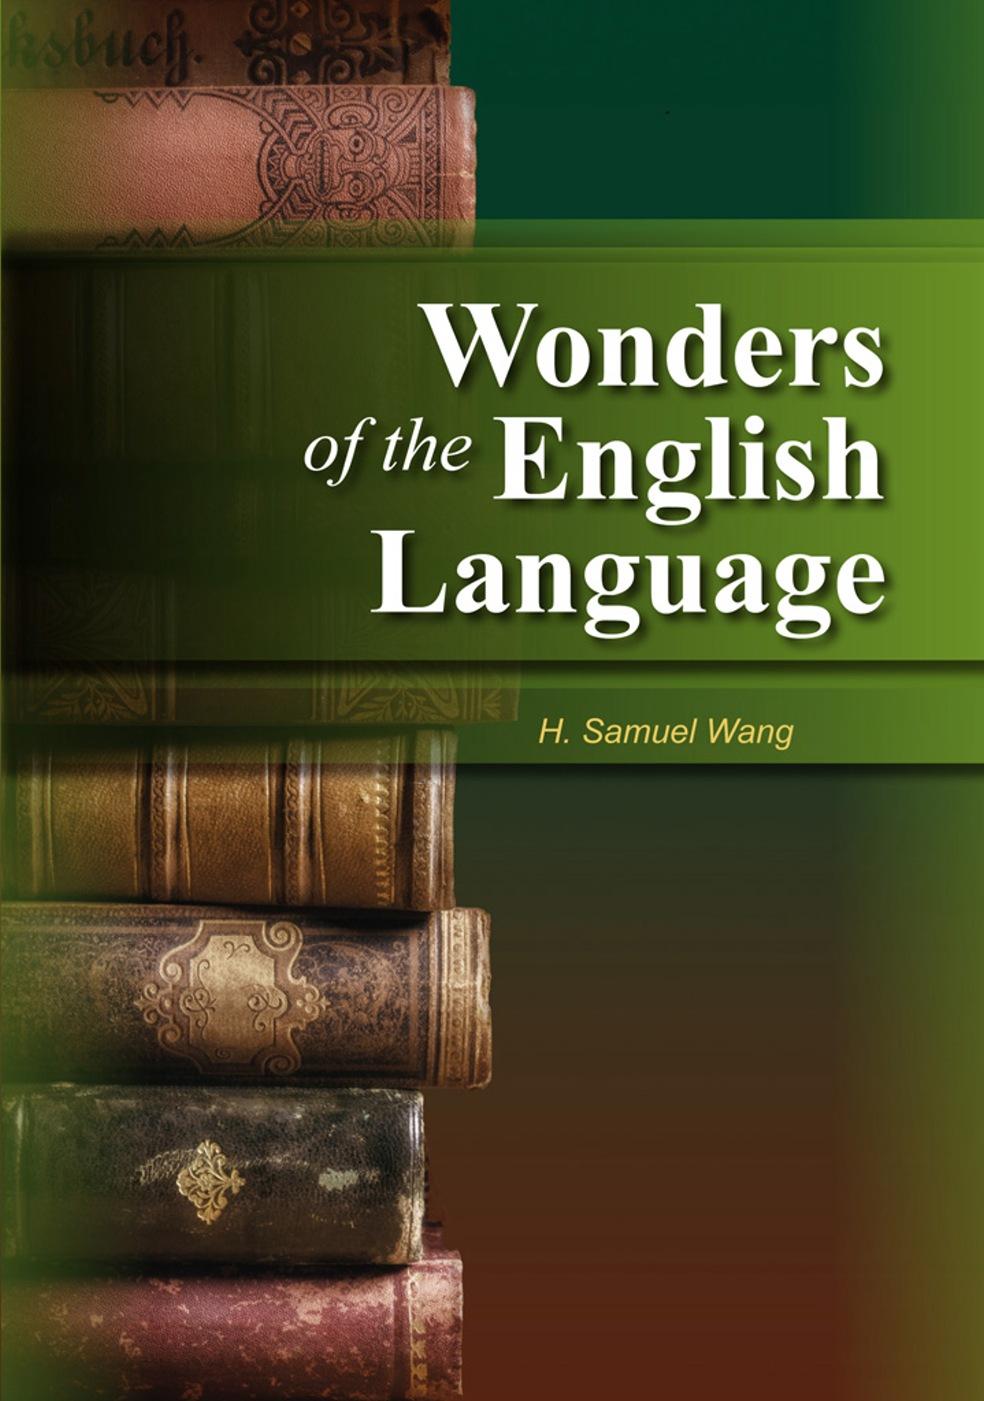 Wonders of the English Language